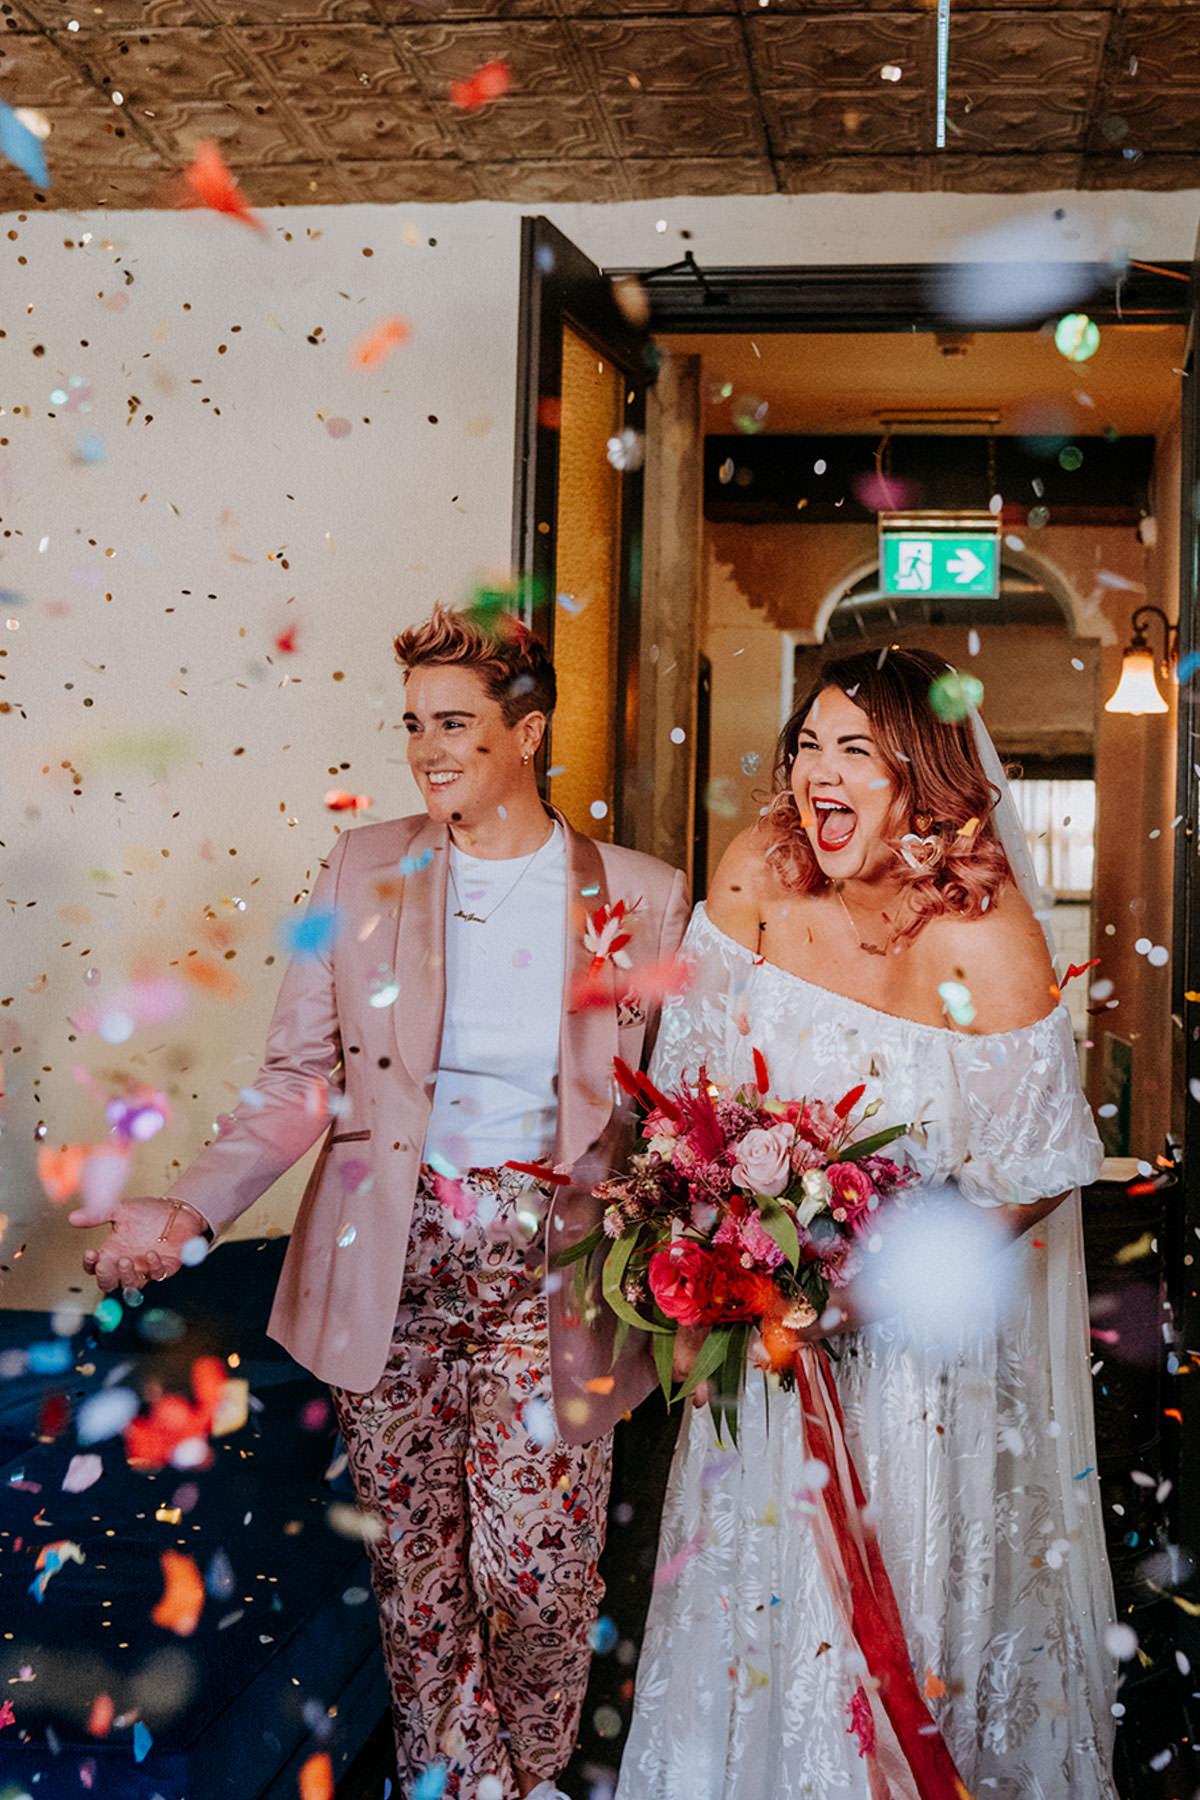 London Micro Weddings - Fleming Photo